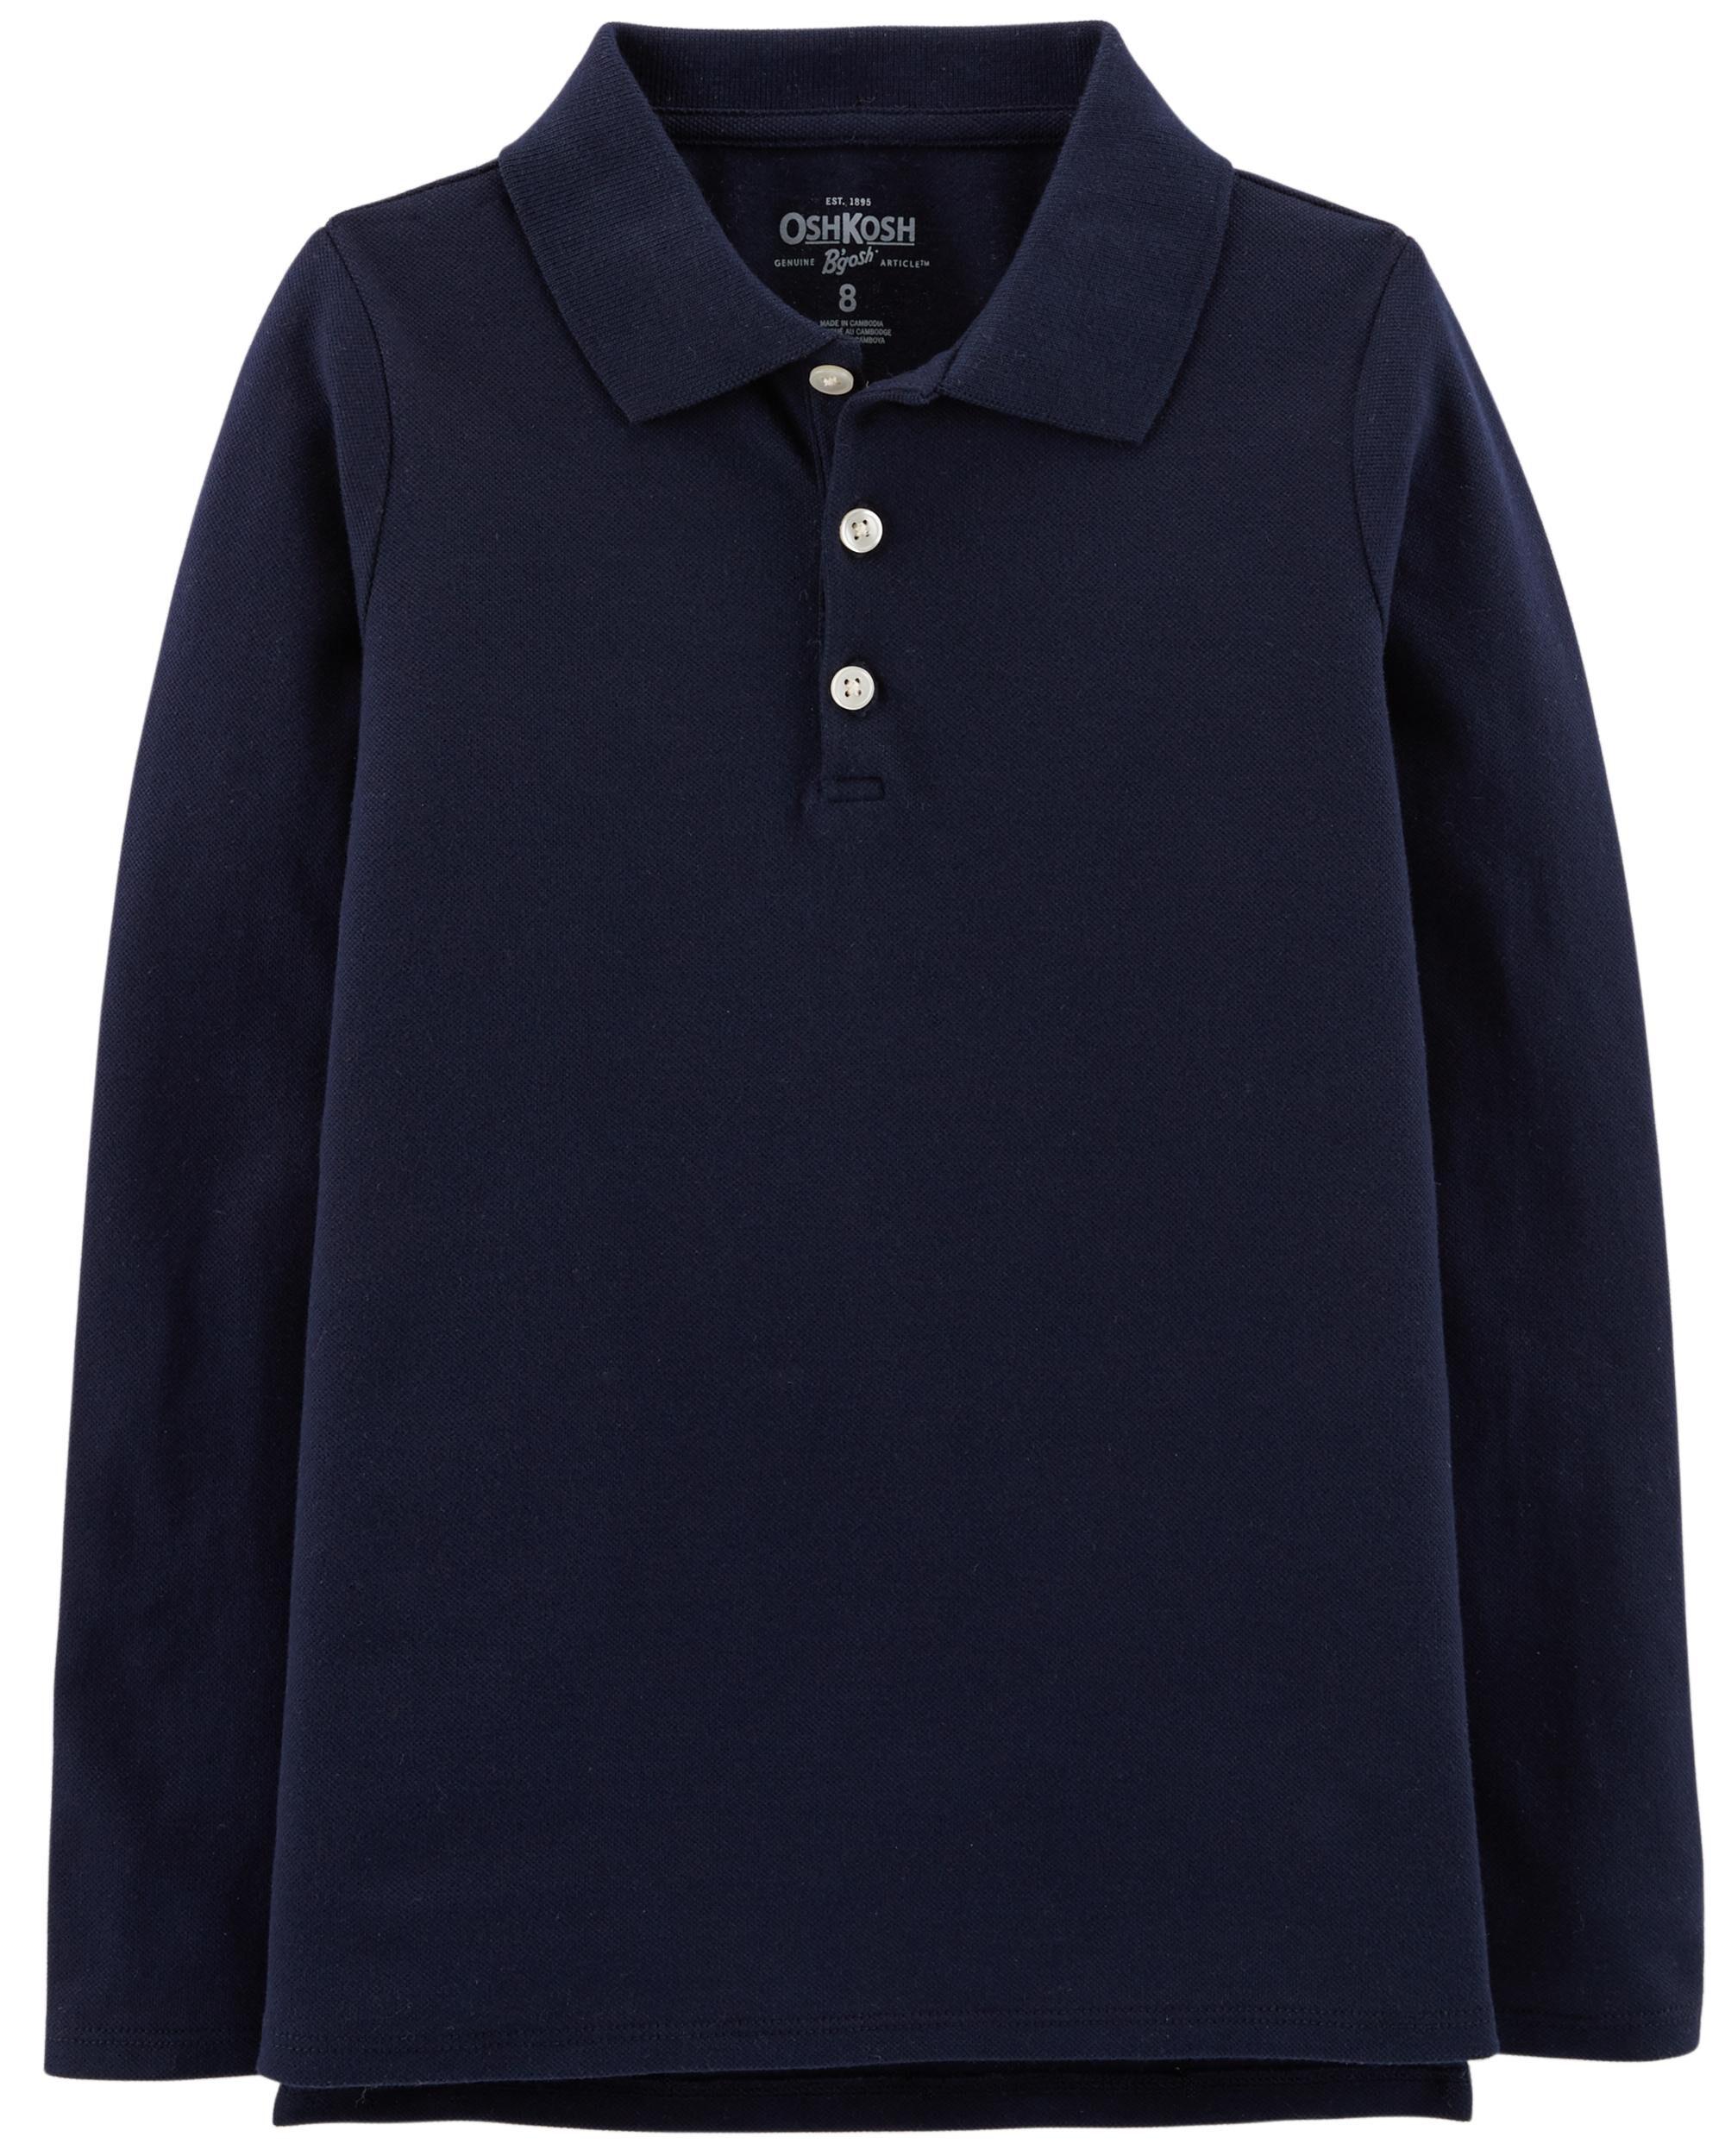 OshKosh BGosh Boys Long Sleeve Uniform Polo